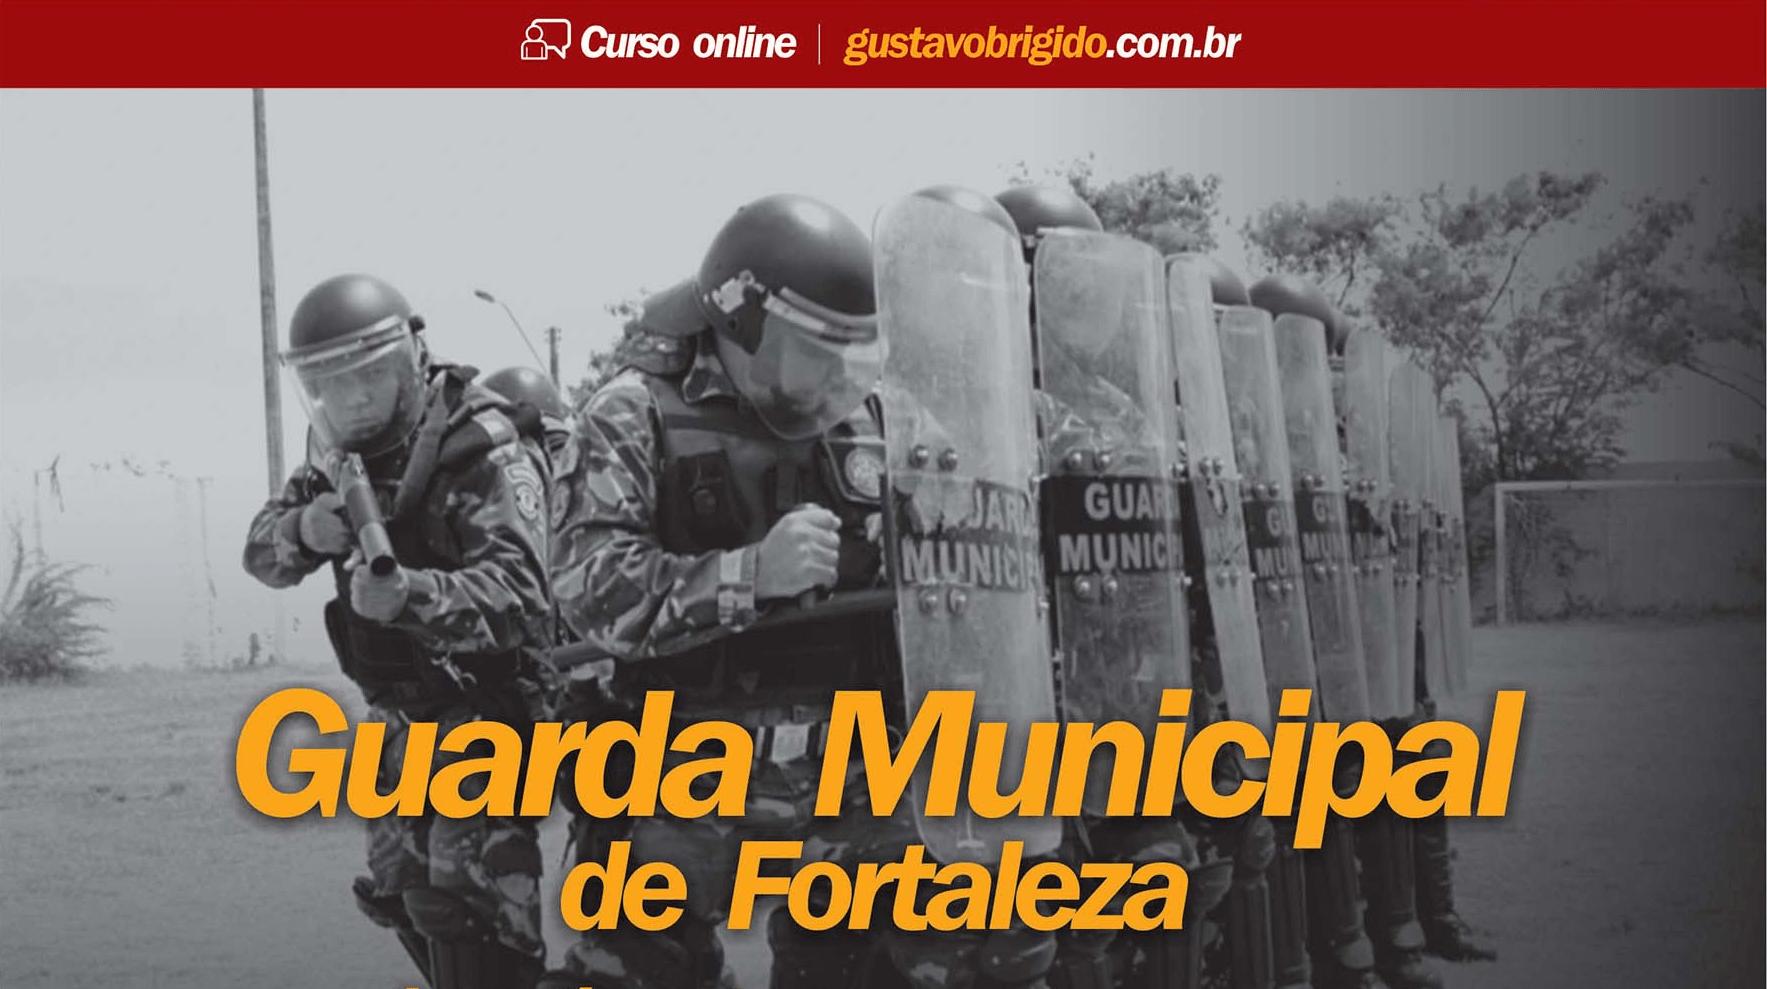 GMF - CURSO COMPLETO PARA A GUARDA MUNICIPAL DE FORTALEZA